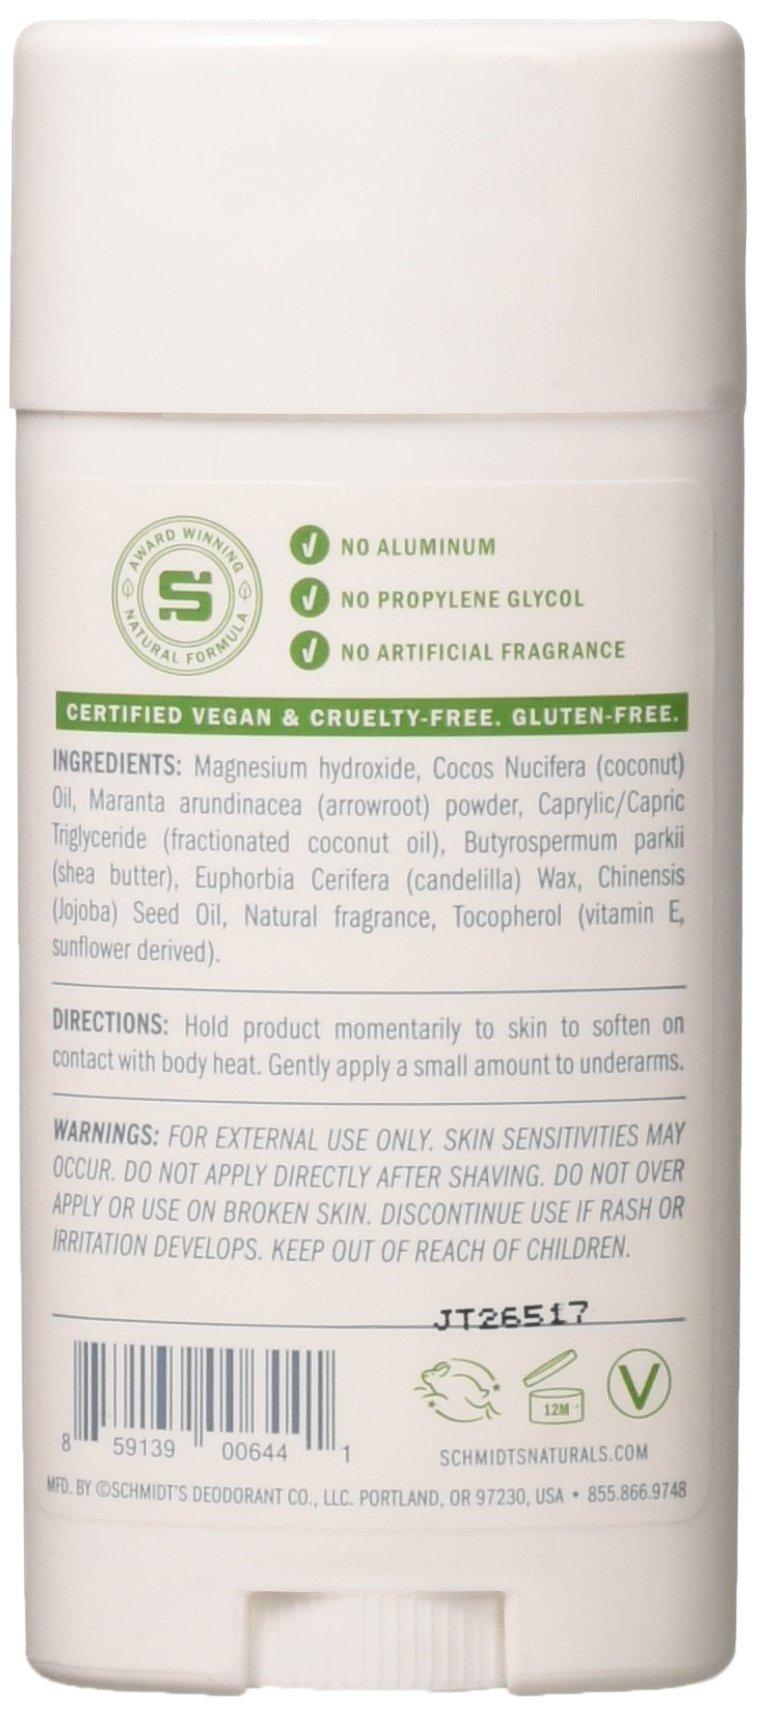 Schmidt's Natural Deodorant for Sensitive Skin - Jasmine Tea, 3.25 ounces. Stick for Women and Men by Schmidt's Deodorant (Image #1)